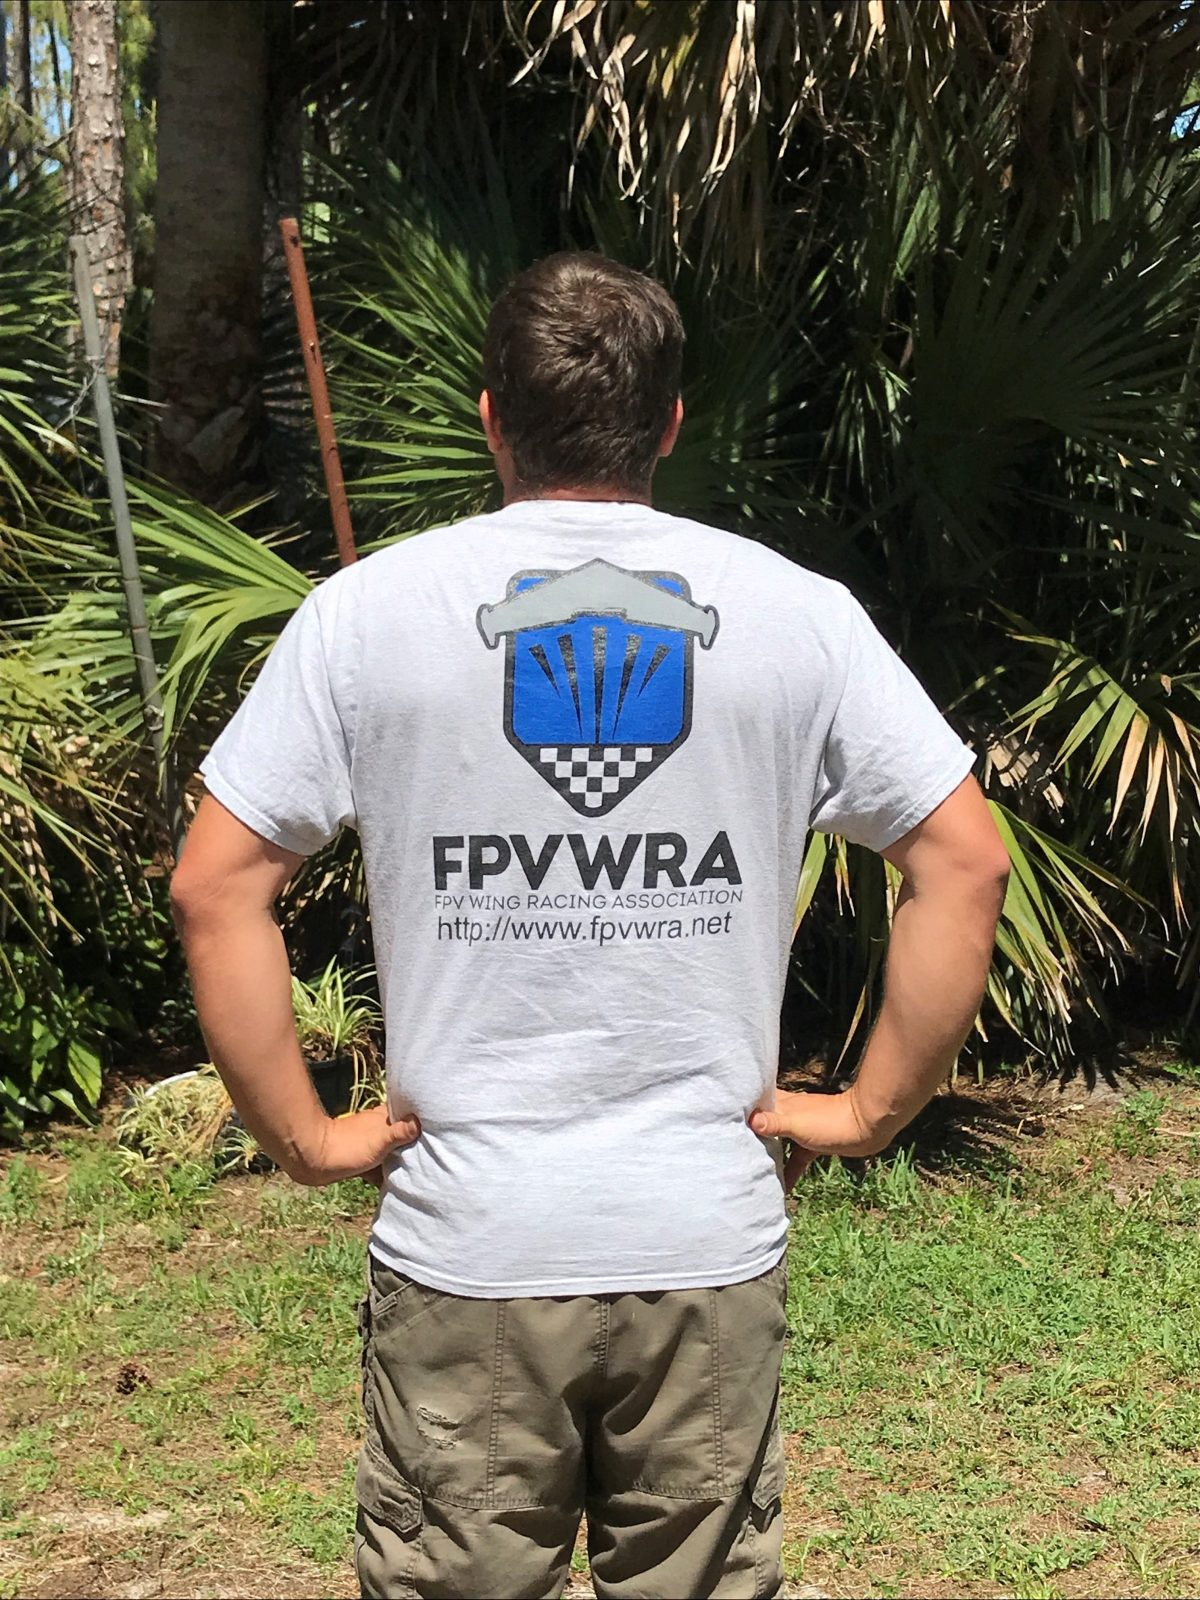 FPVWRA Shirt